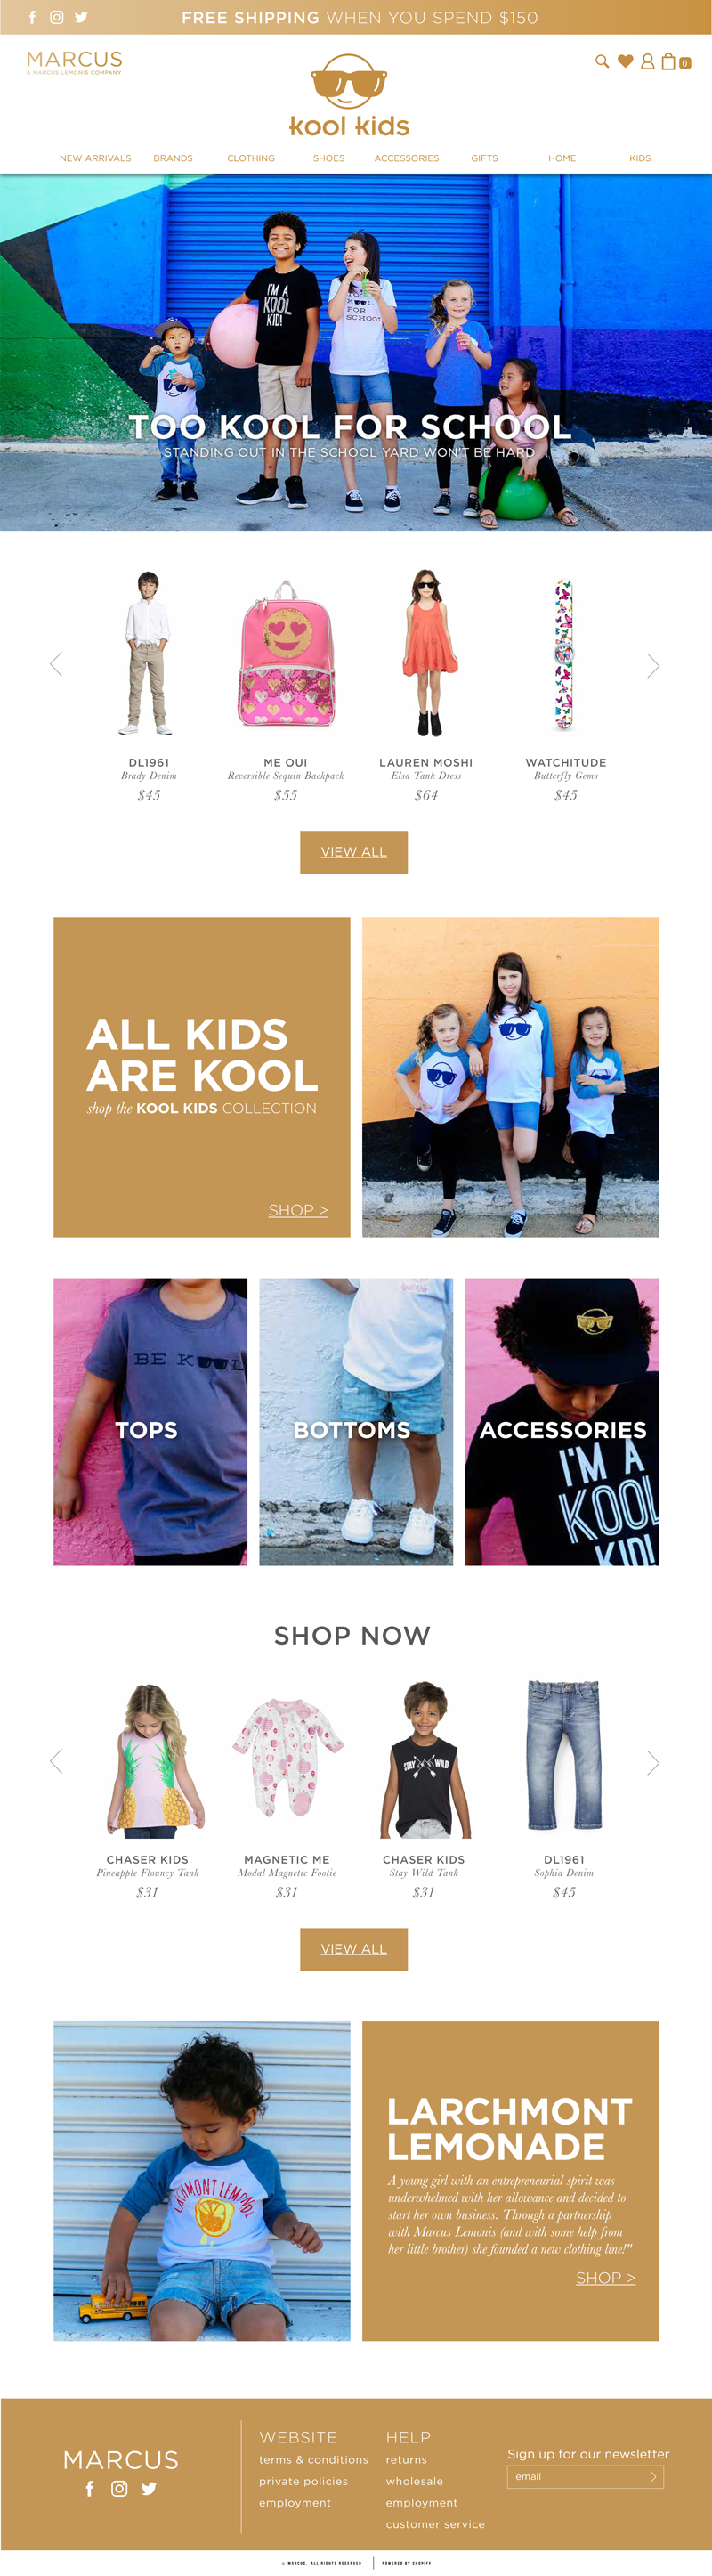 Marcus_Kool-Kids-copy.png